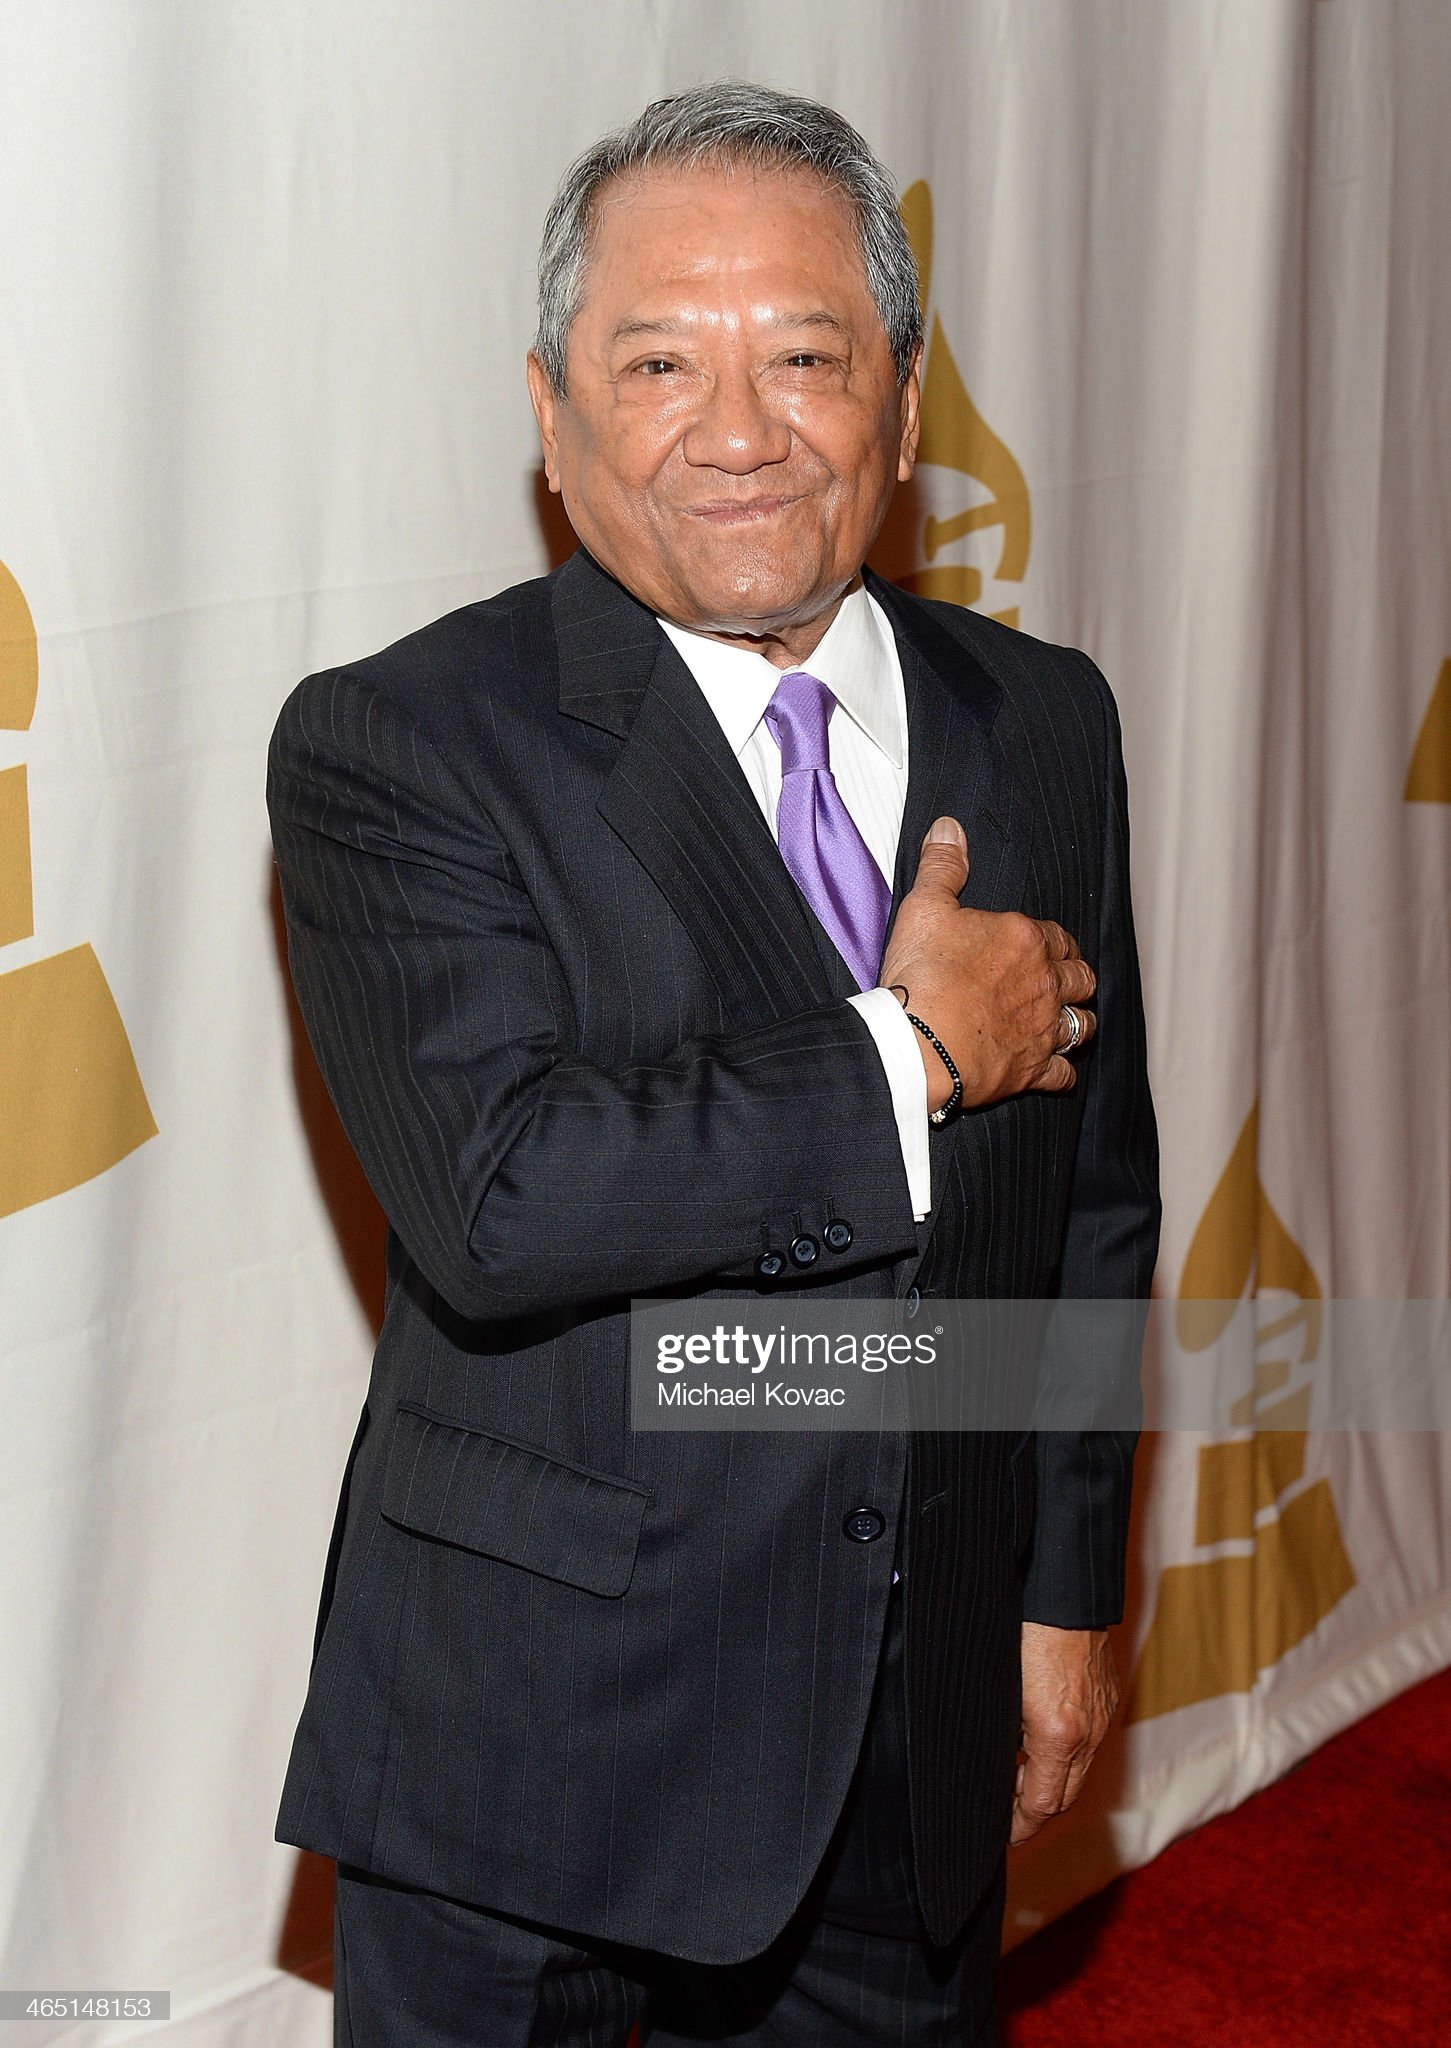 ¿Cuánto mide Armando Manzanero? - Altura - Real height Musician-armando-manzanero-arrives-at-the-special-merit-awards-of-picture-id465148153?s=2048x2048